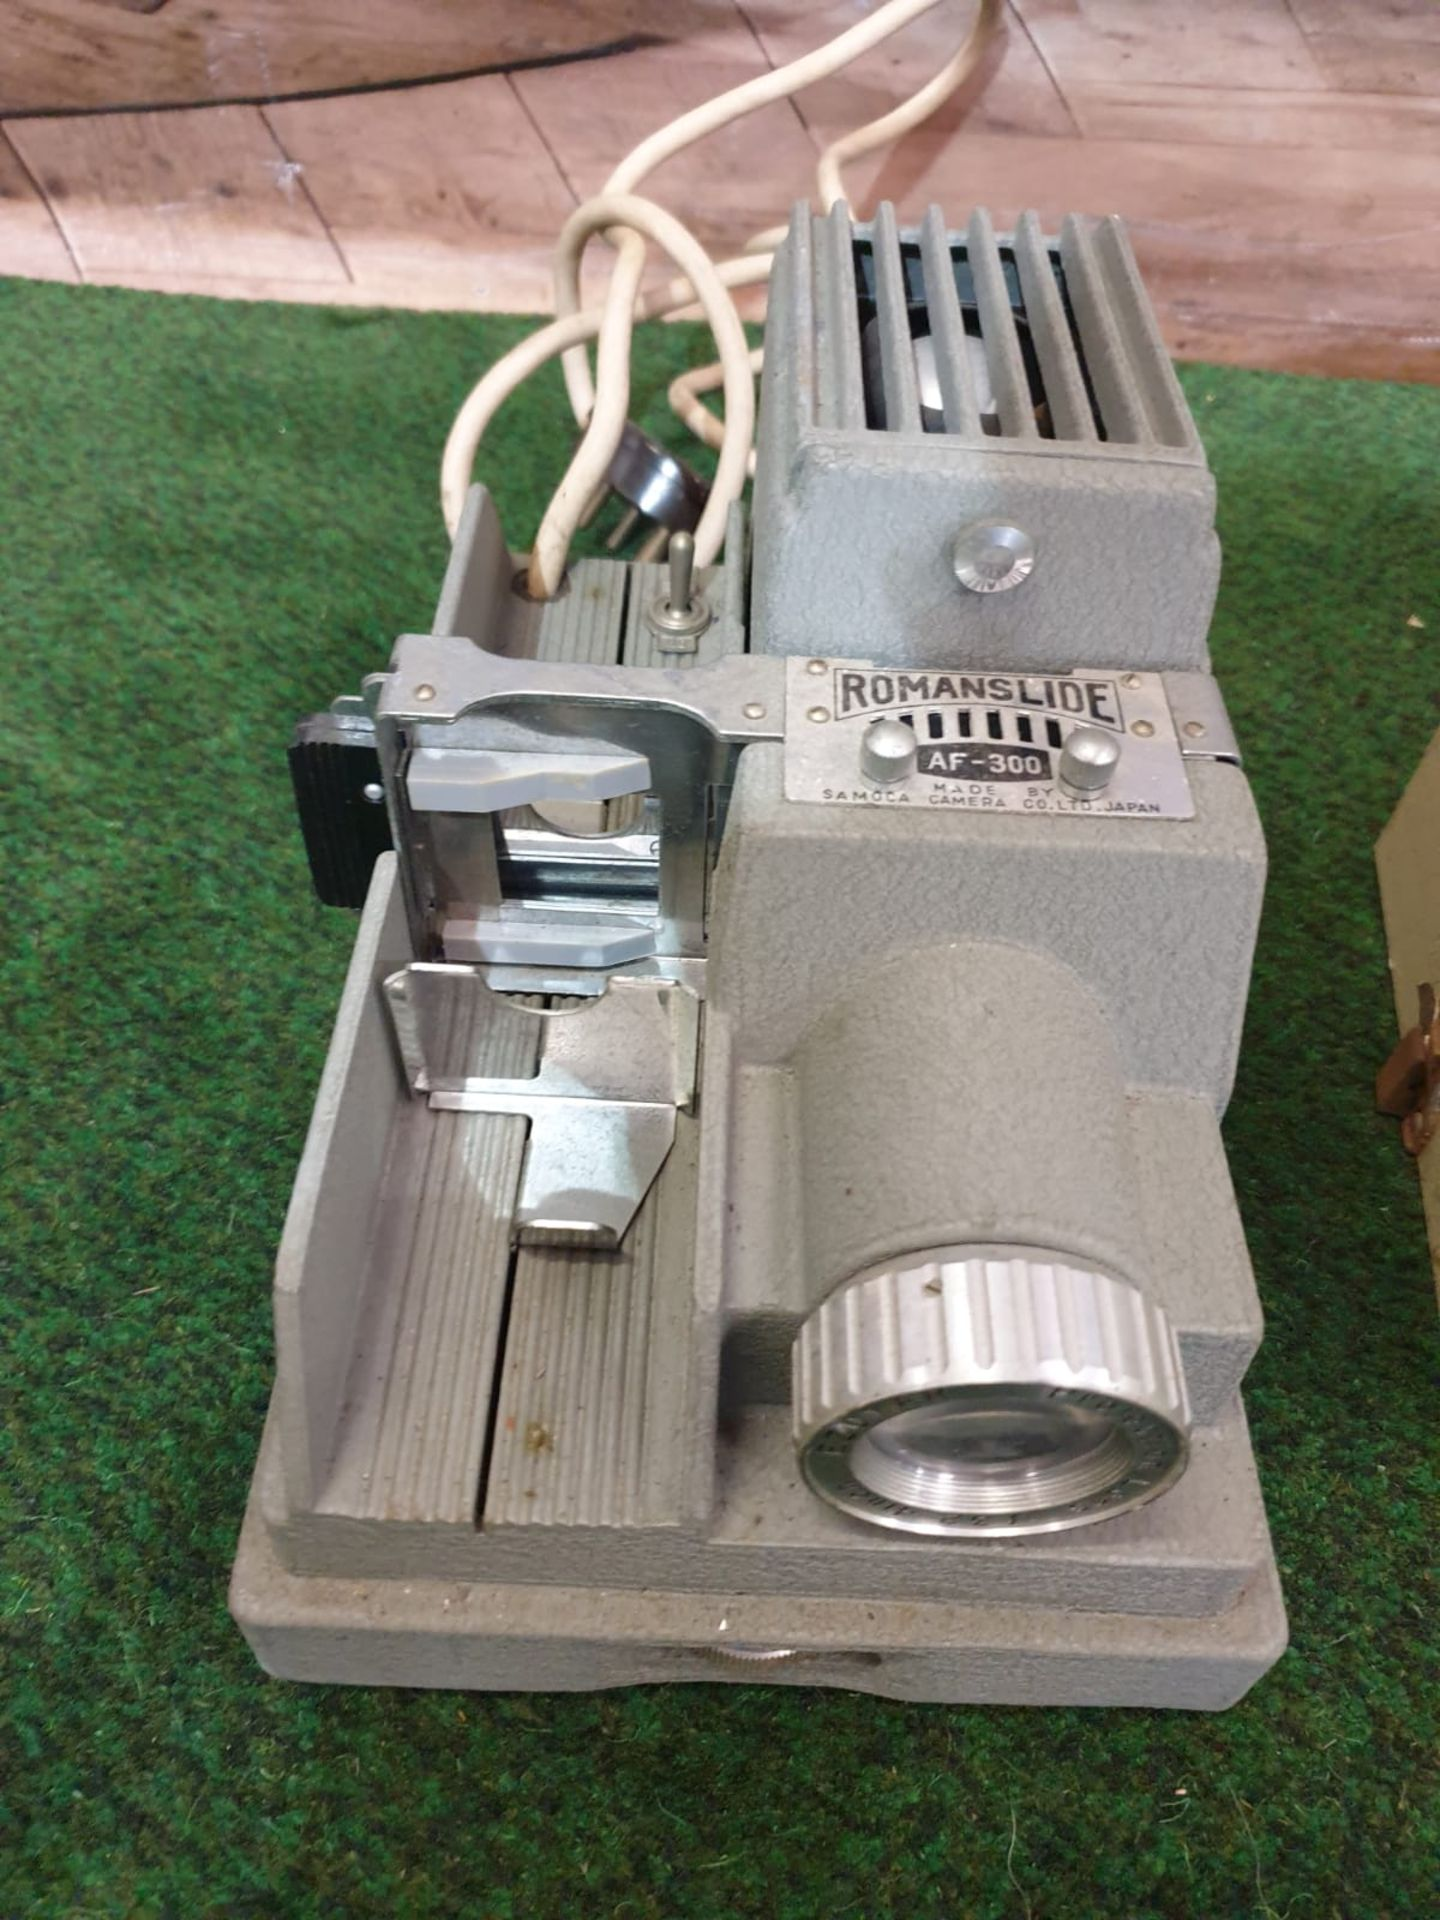 Samoca Camera AF-300 Projector Roman Slides Projector Screen 26 x 18 x 16cm Dates to 1955- 1956